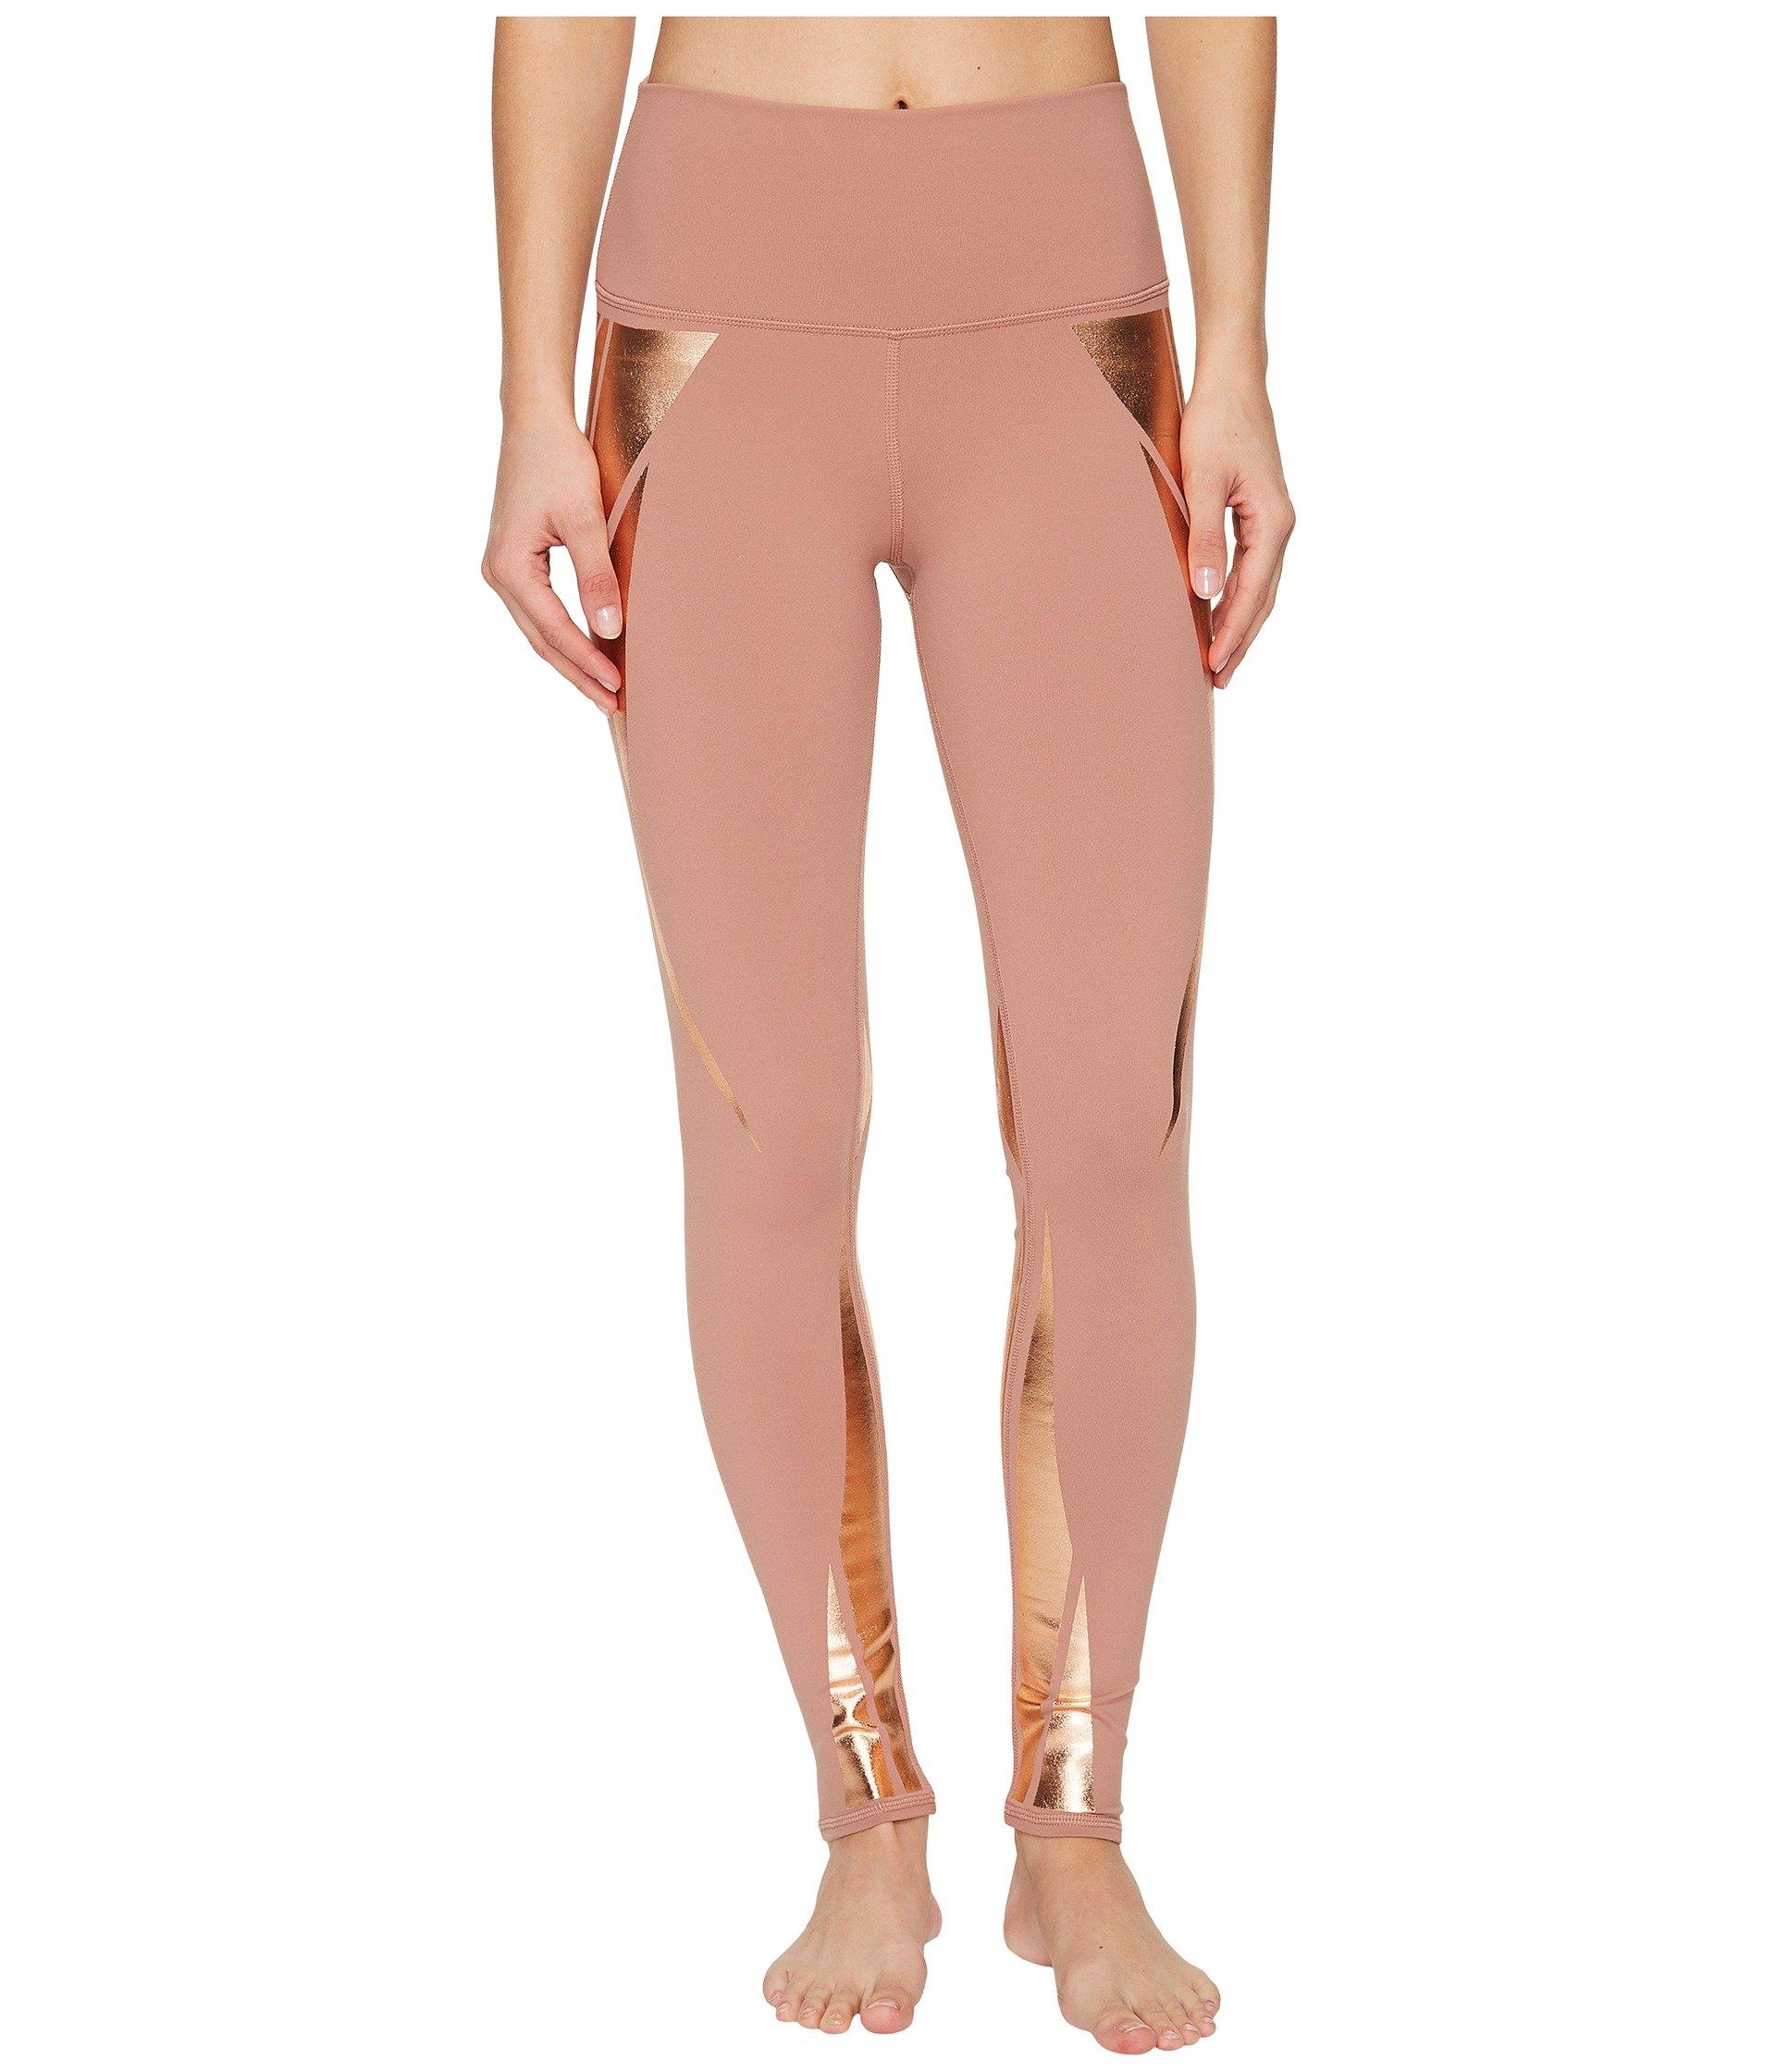 Alo Yoga Women's High Waist Airbrush Legging, Rosewater/Rosegold Facet, S